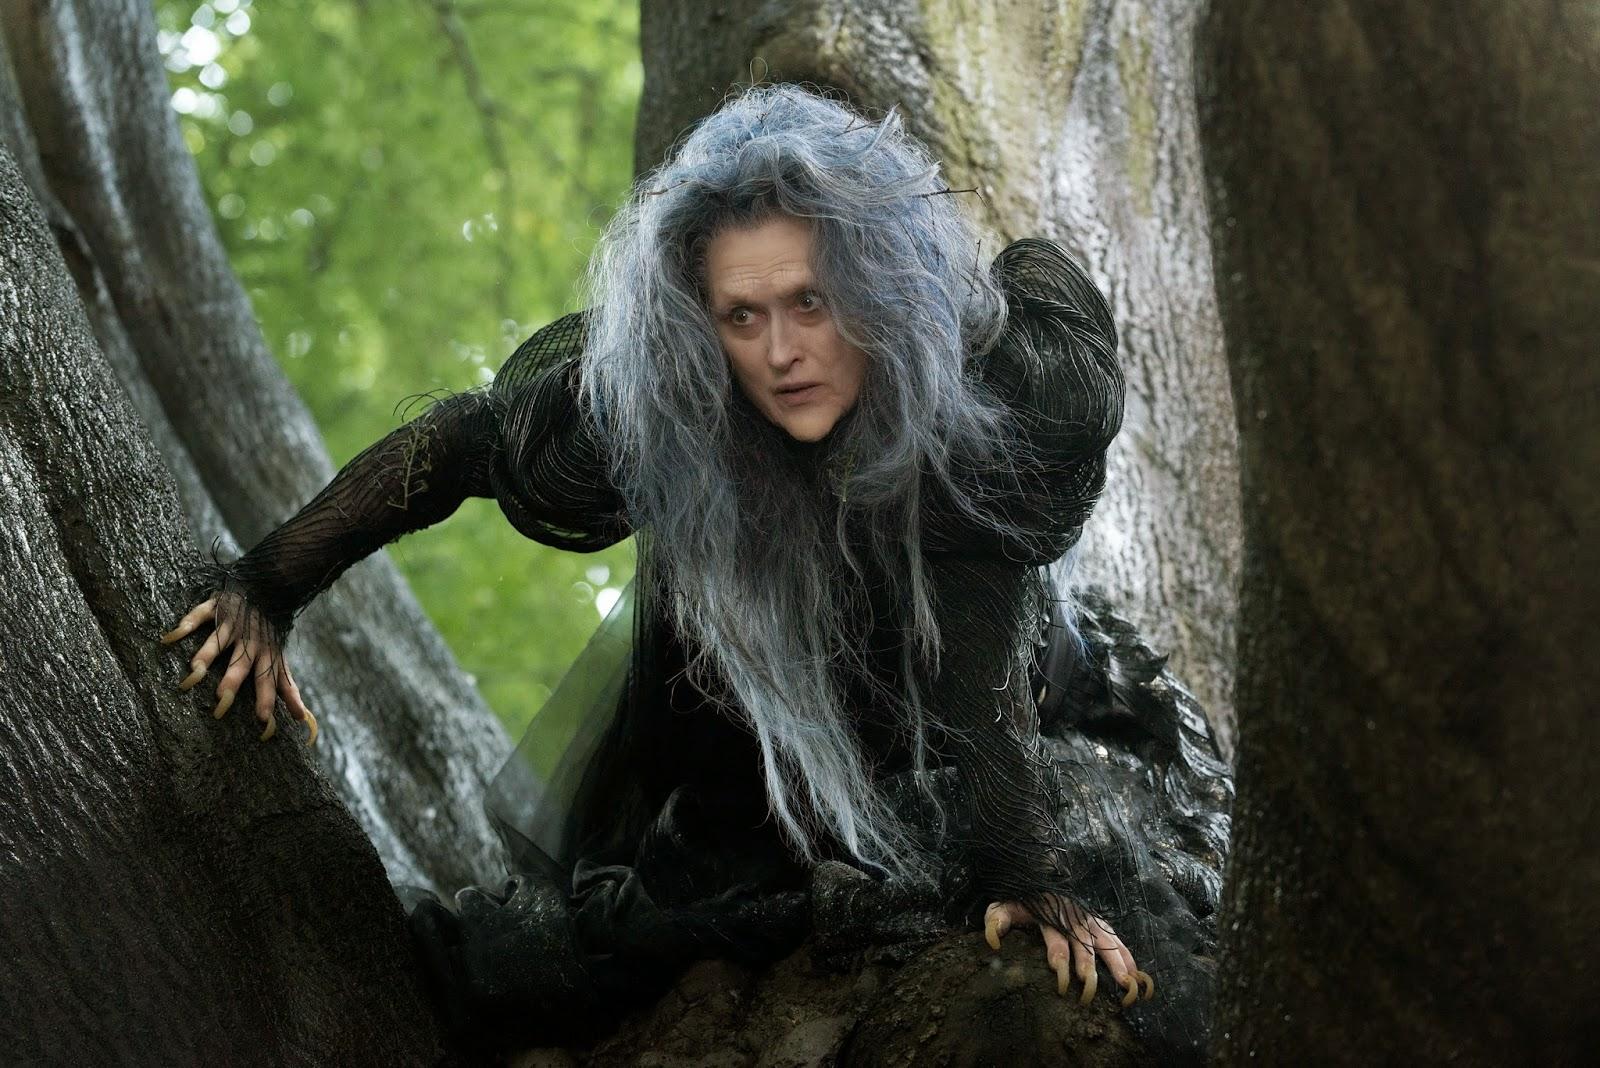 Escena de Into the woods